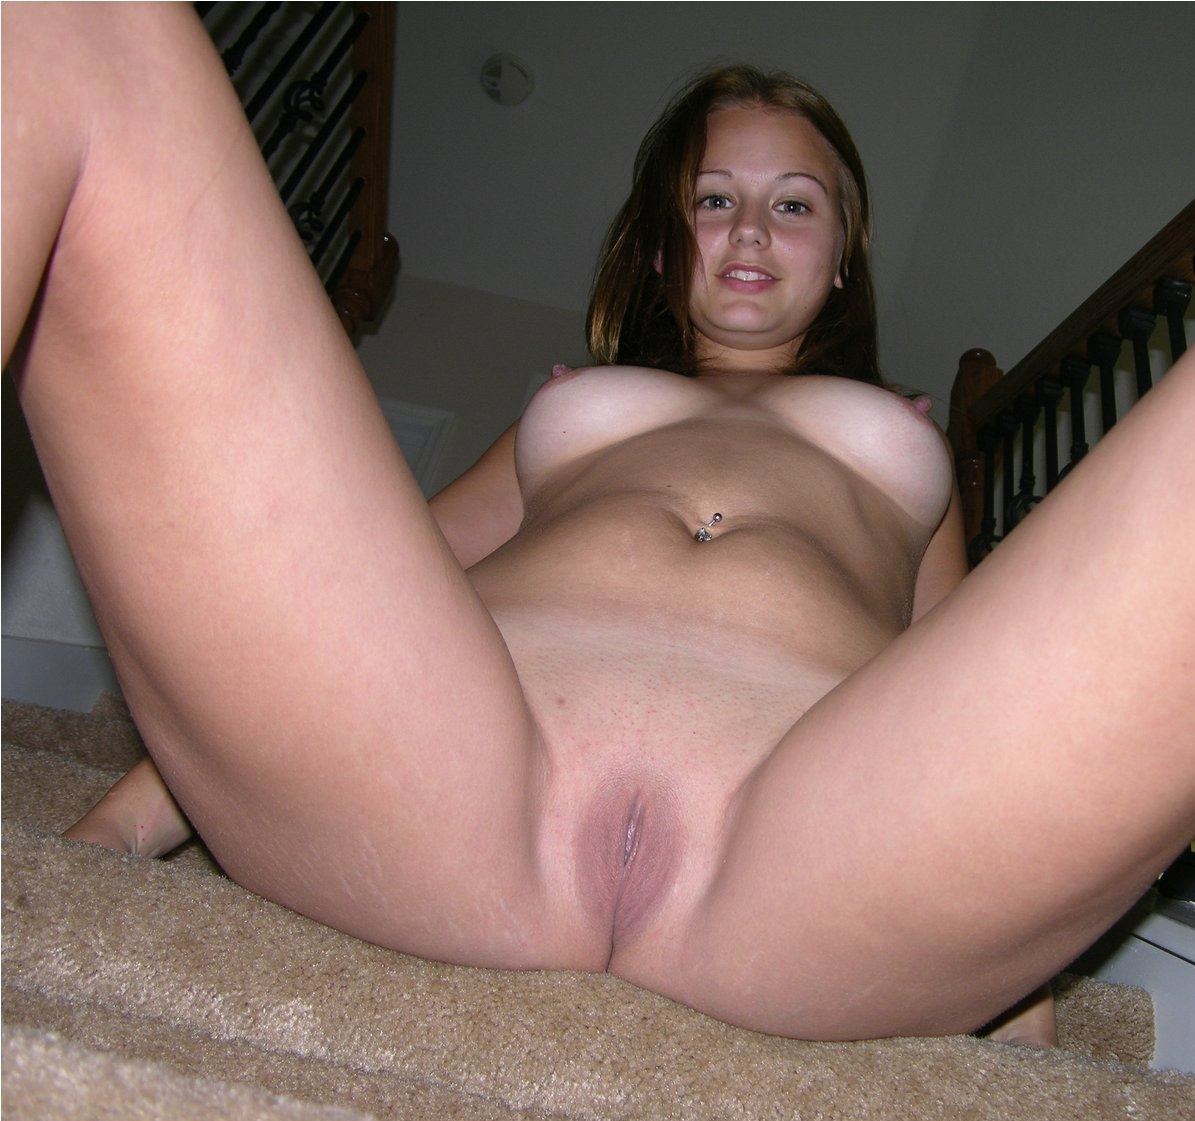 Amateur Girlfriend Shaving Pussy